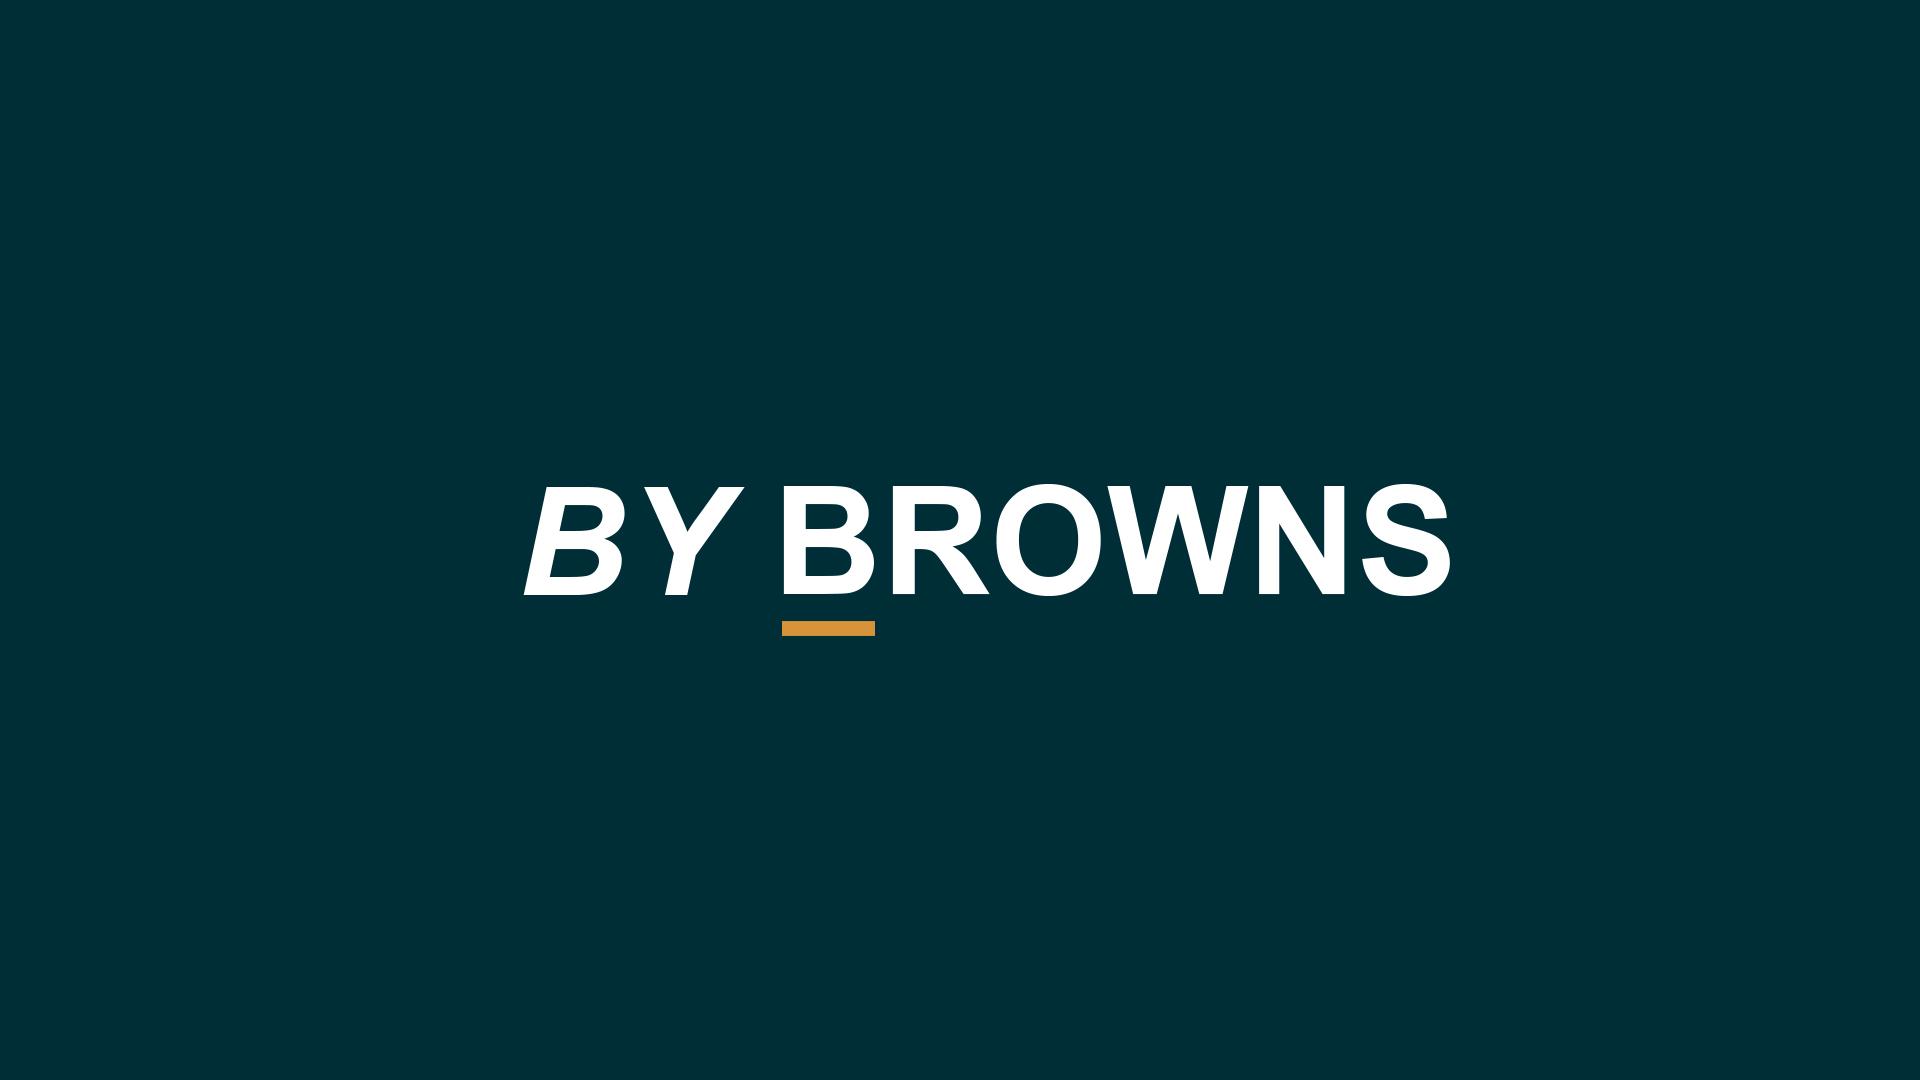 Bybrowns Ltd floor plan in Auckland